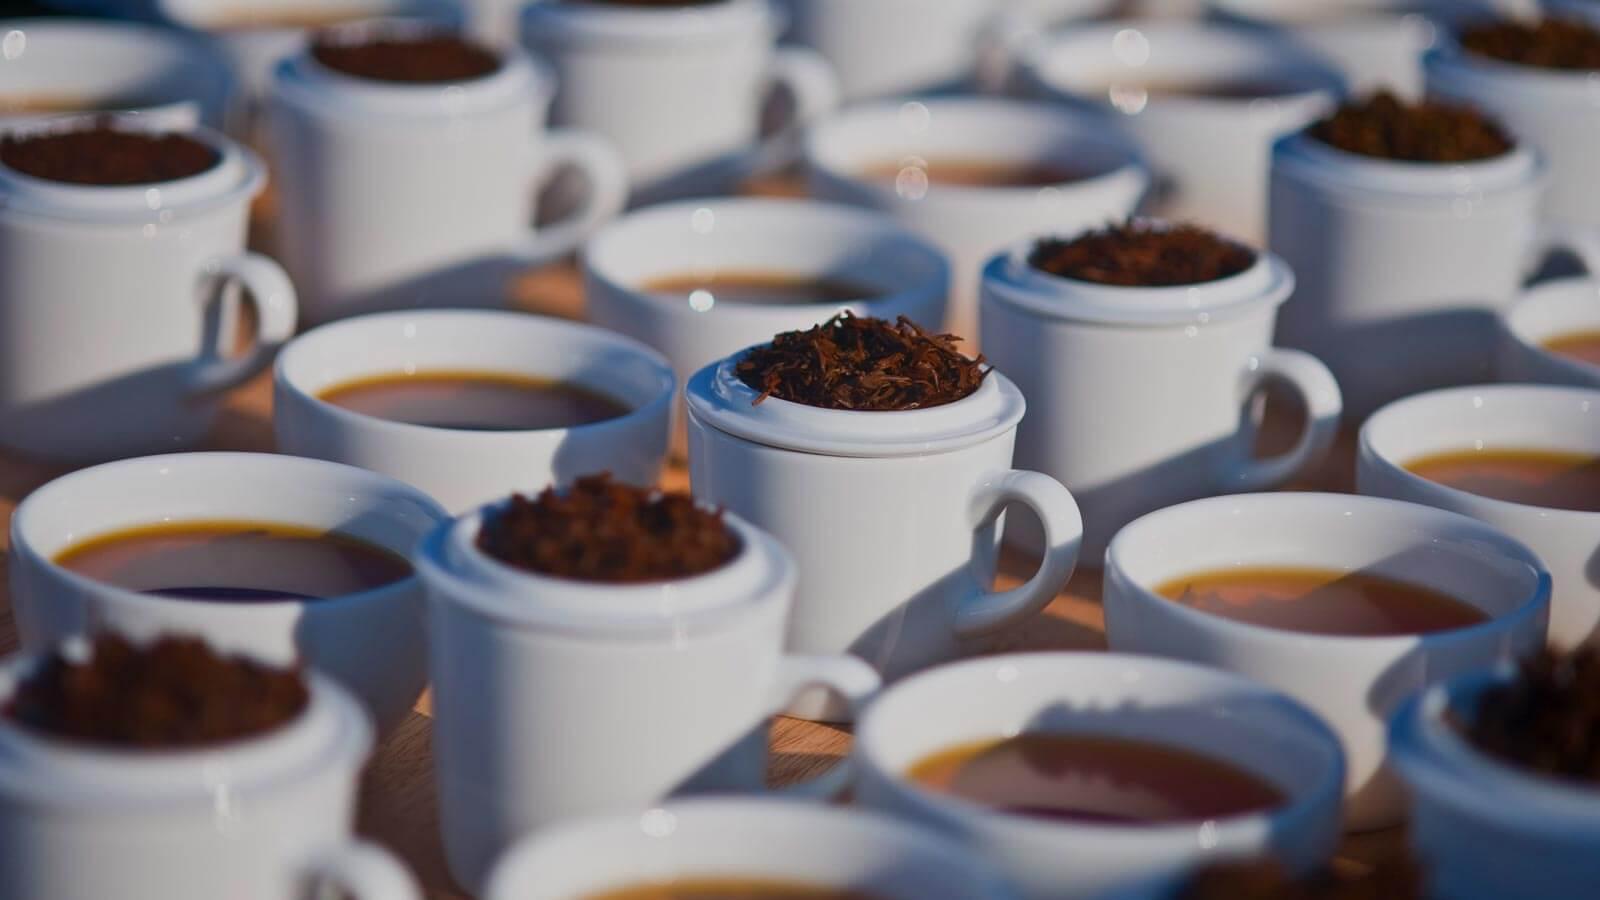 Premium quality Ceylon Tea by MJF Exports